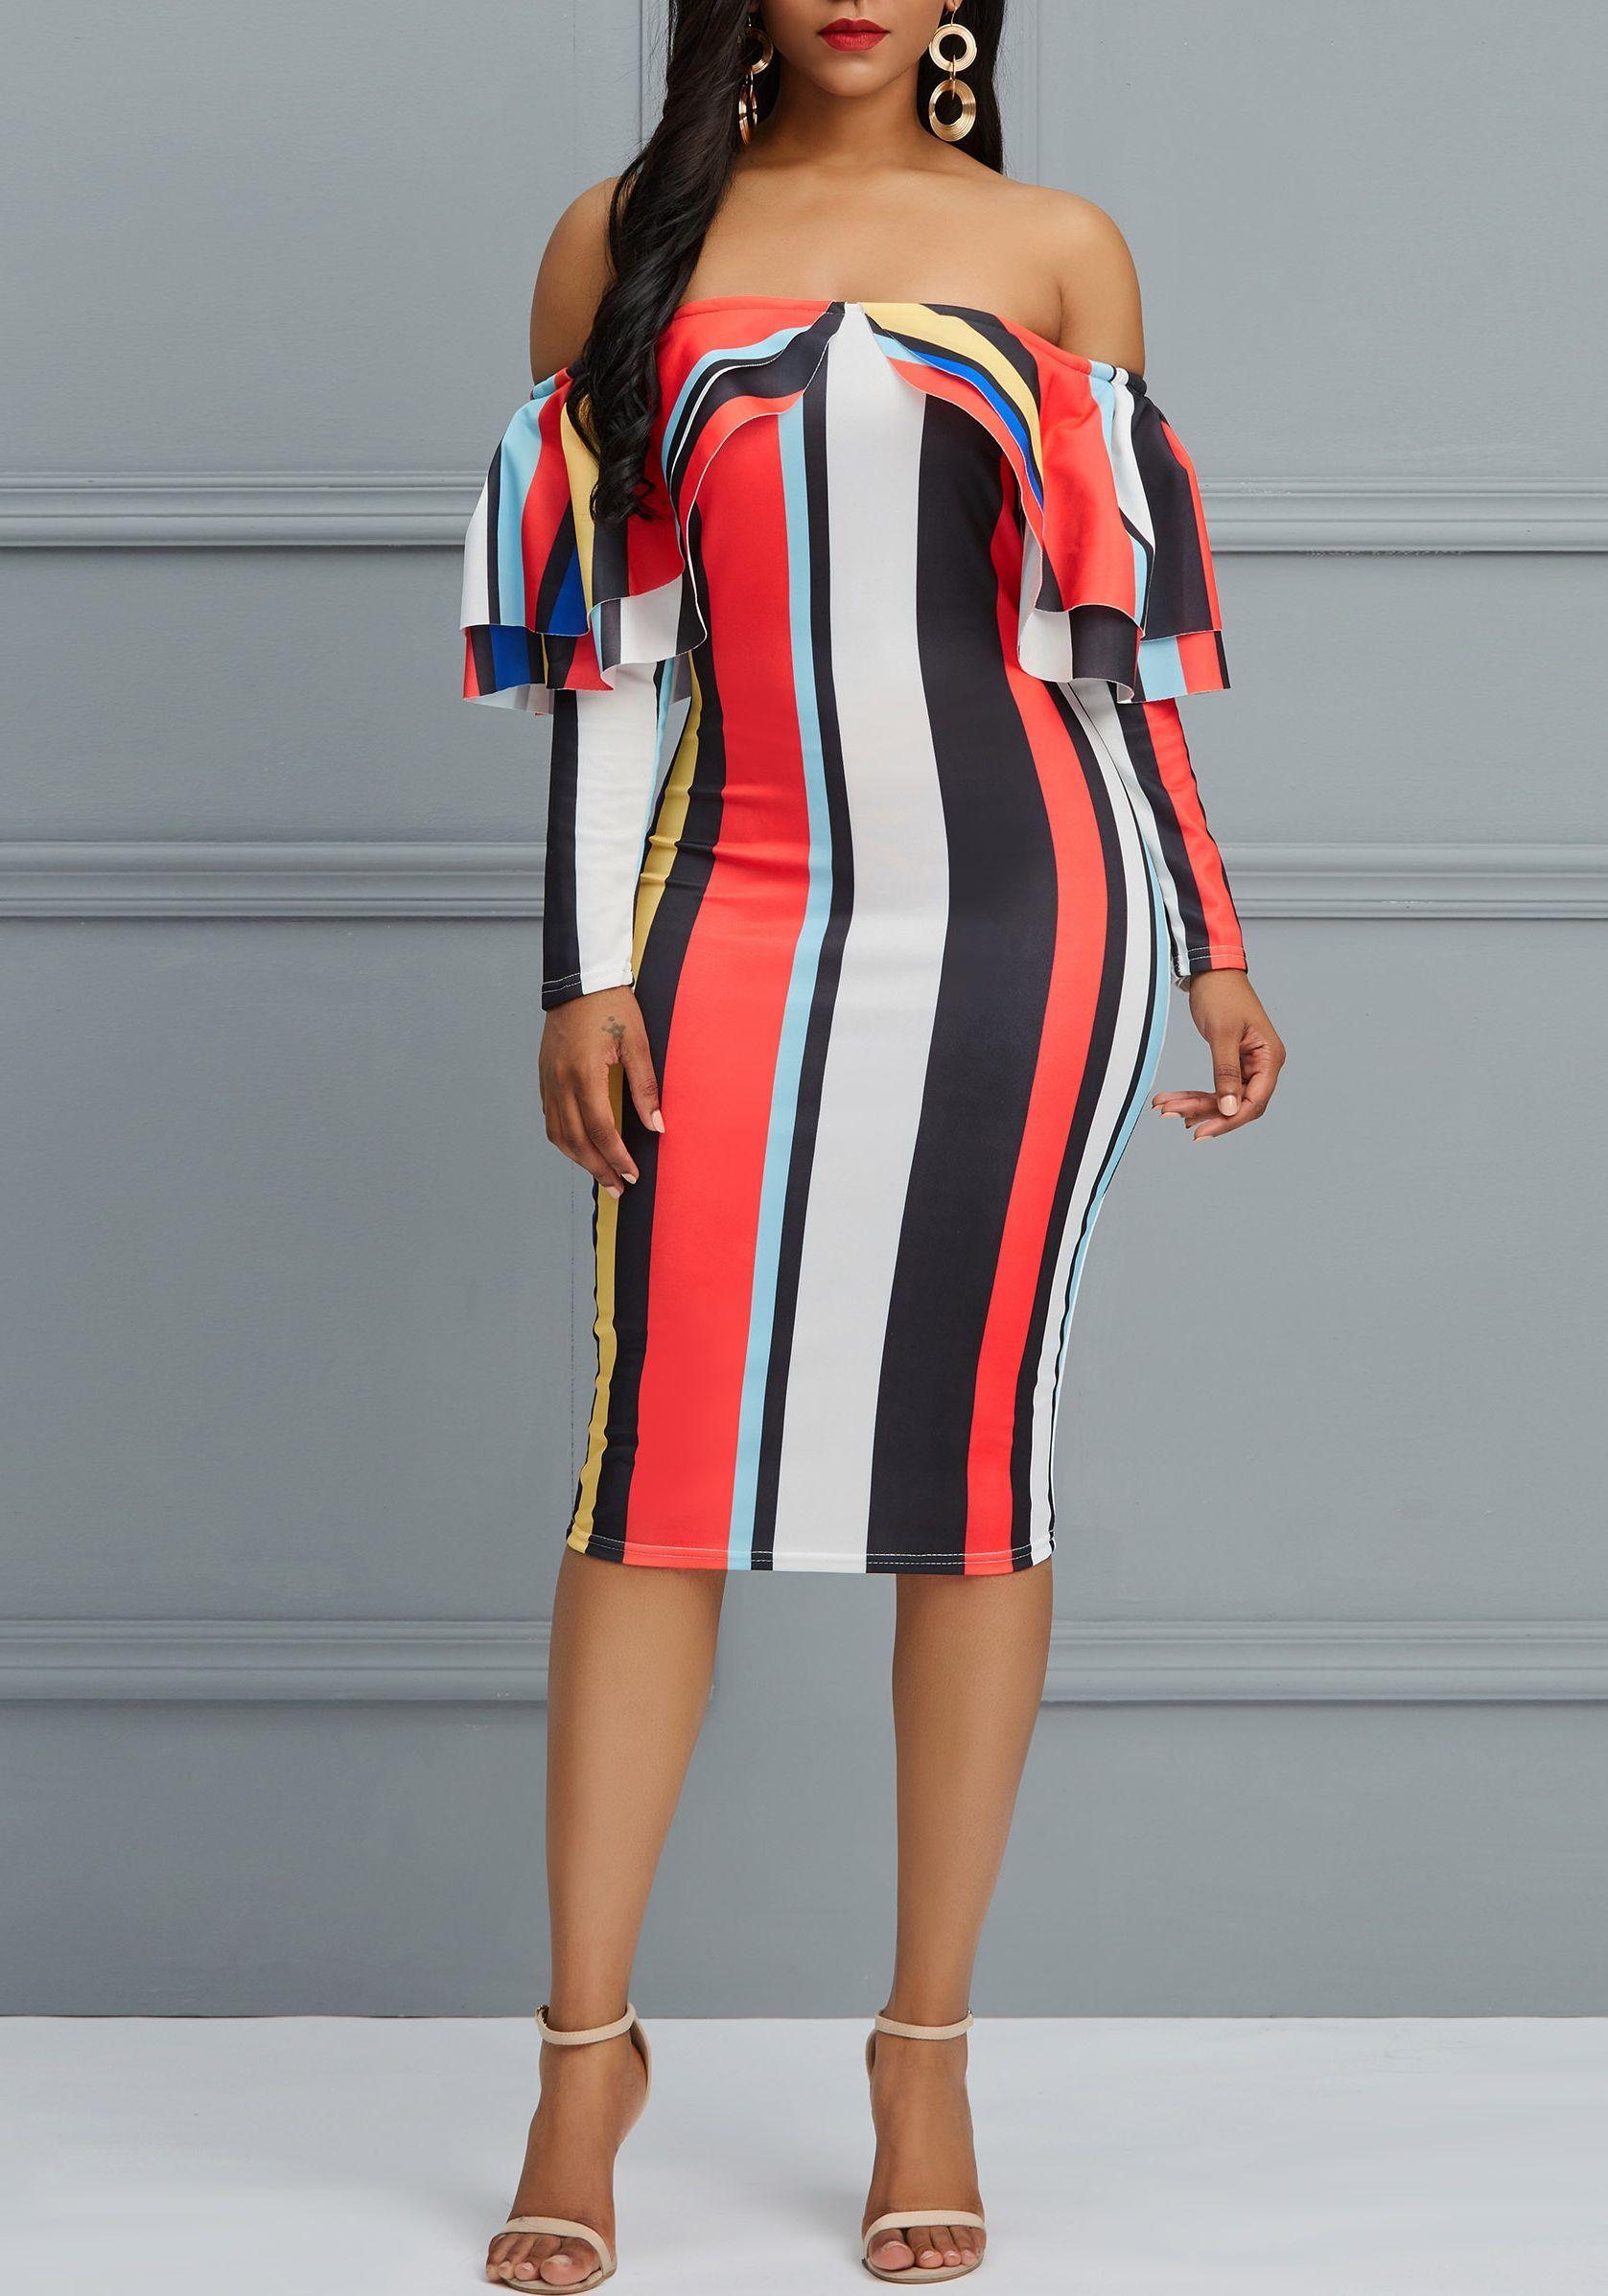 5b7dfd34 Falbala Backless Single Women's Bodycon Dress | Shoespie Dresses ...